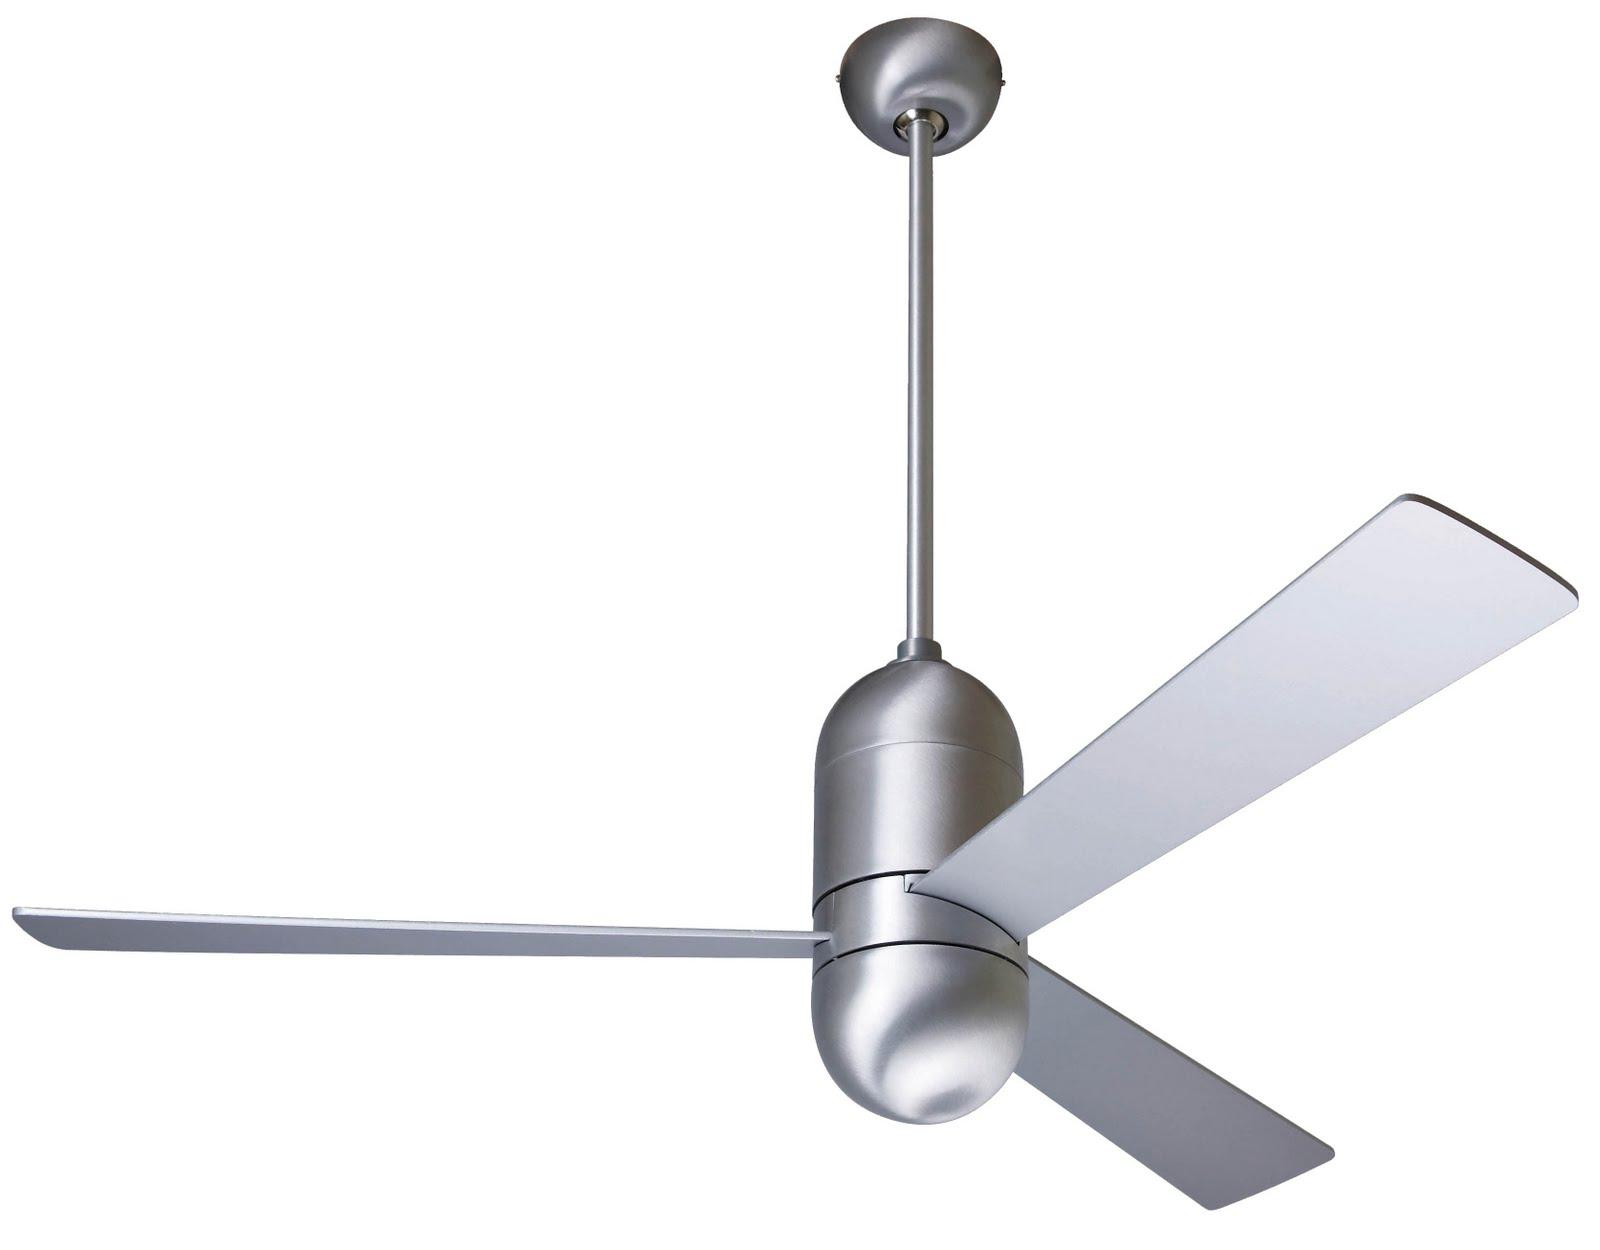 Ceiling Fans | modern design by moderndesign.org